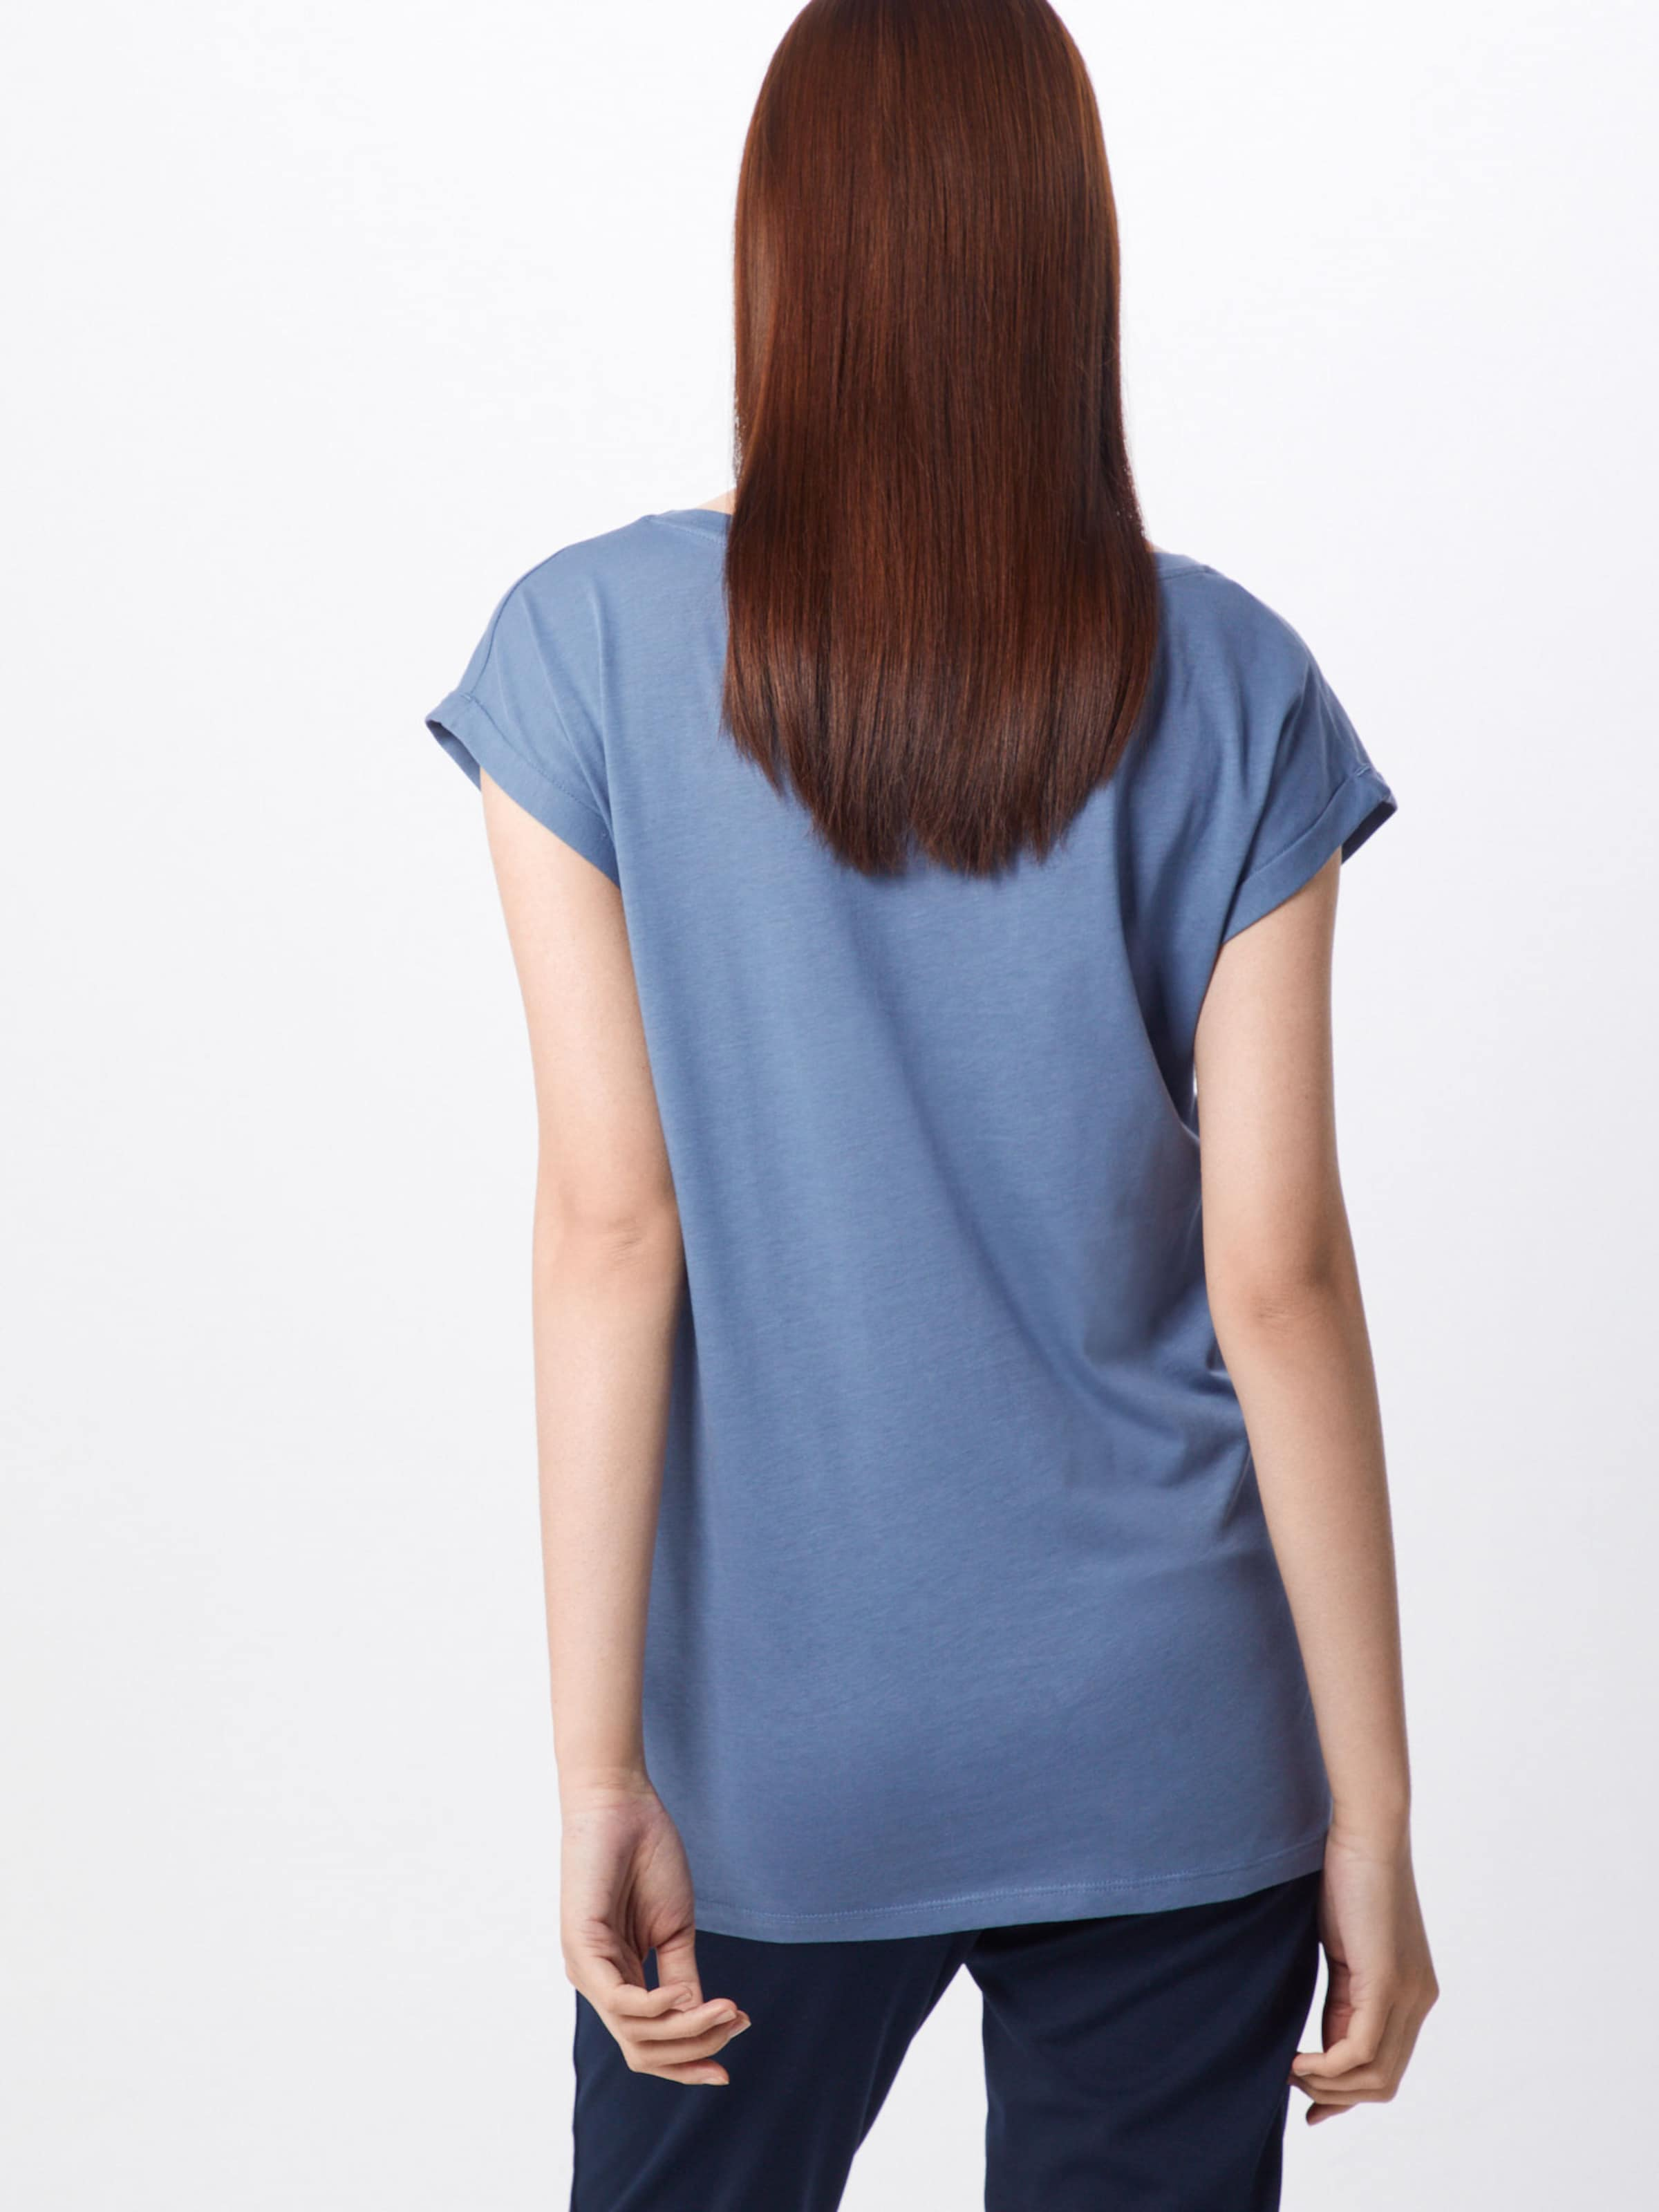 In Taubenblau shirt 'pusteblume' T Iriedaily fbY76vIgy